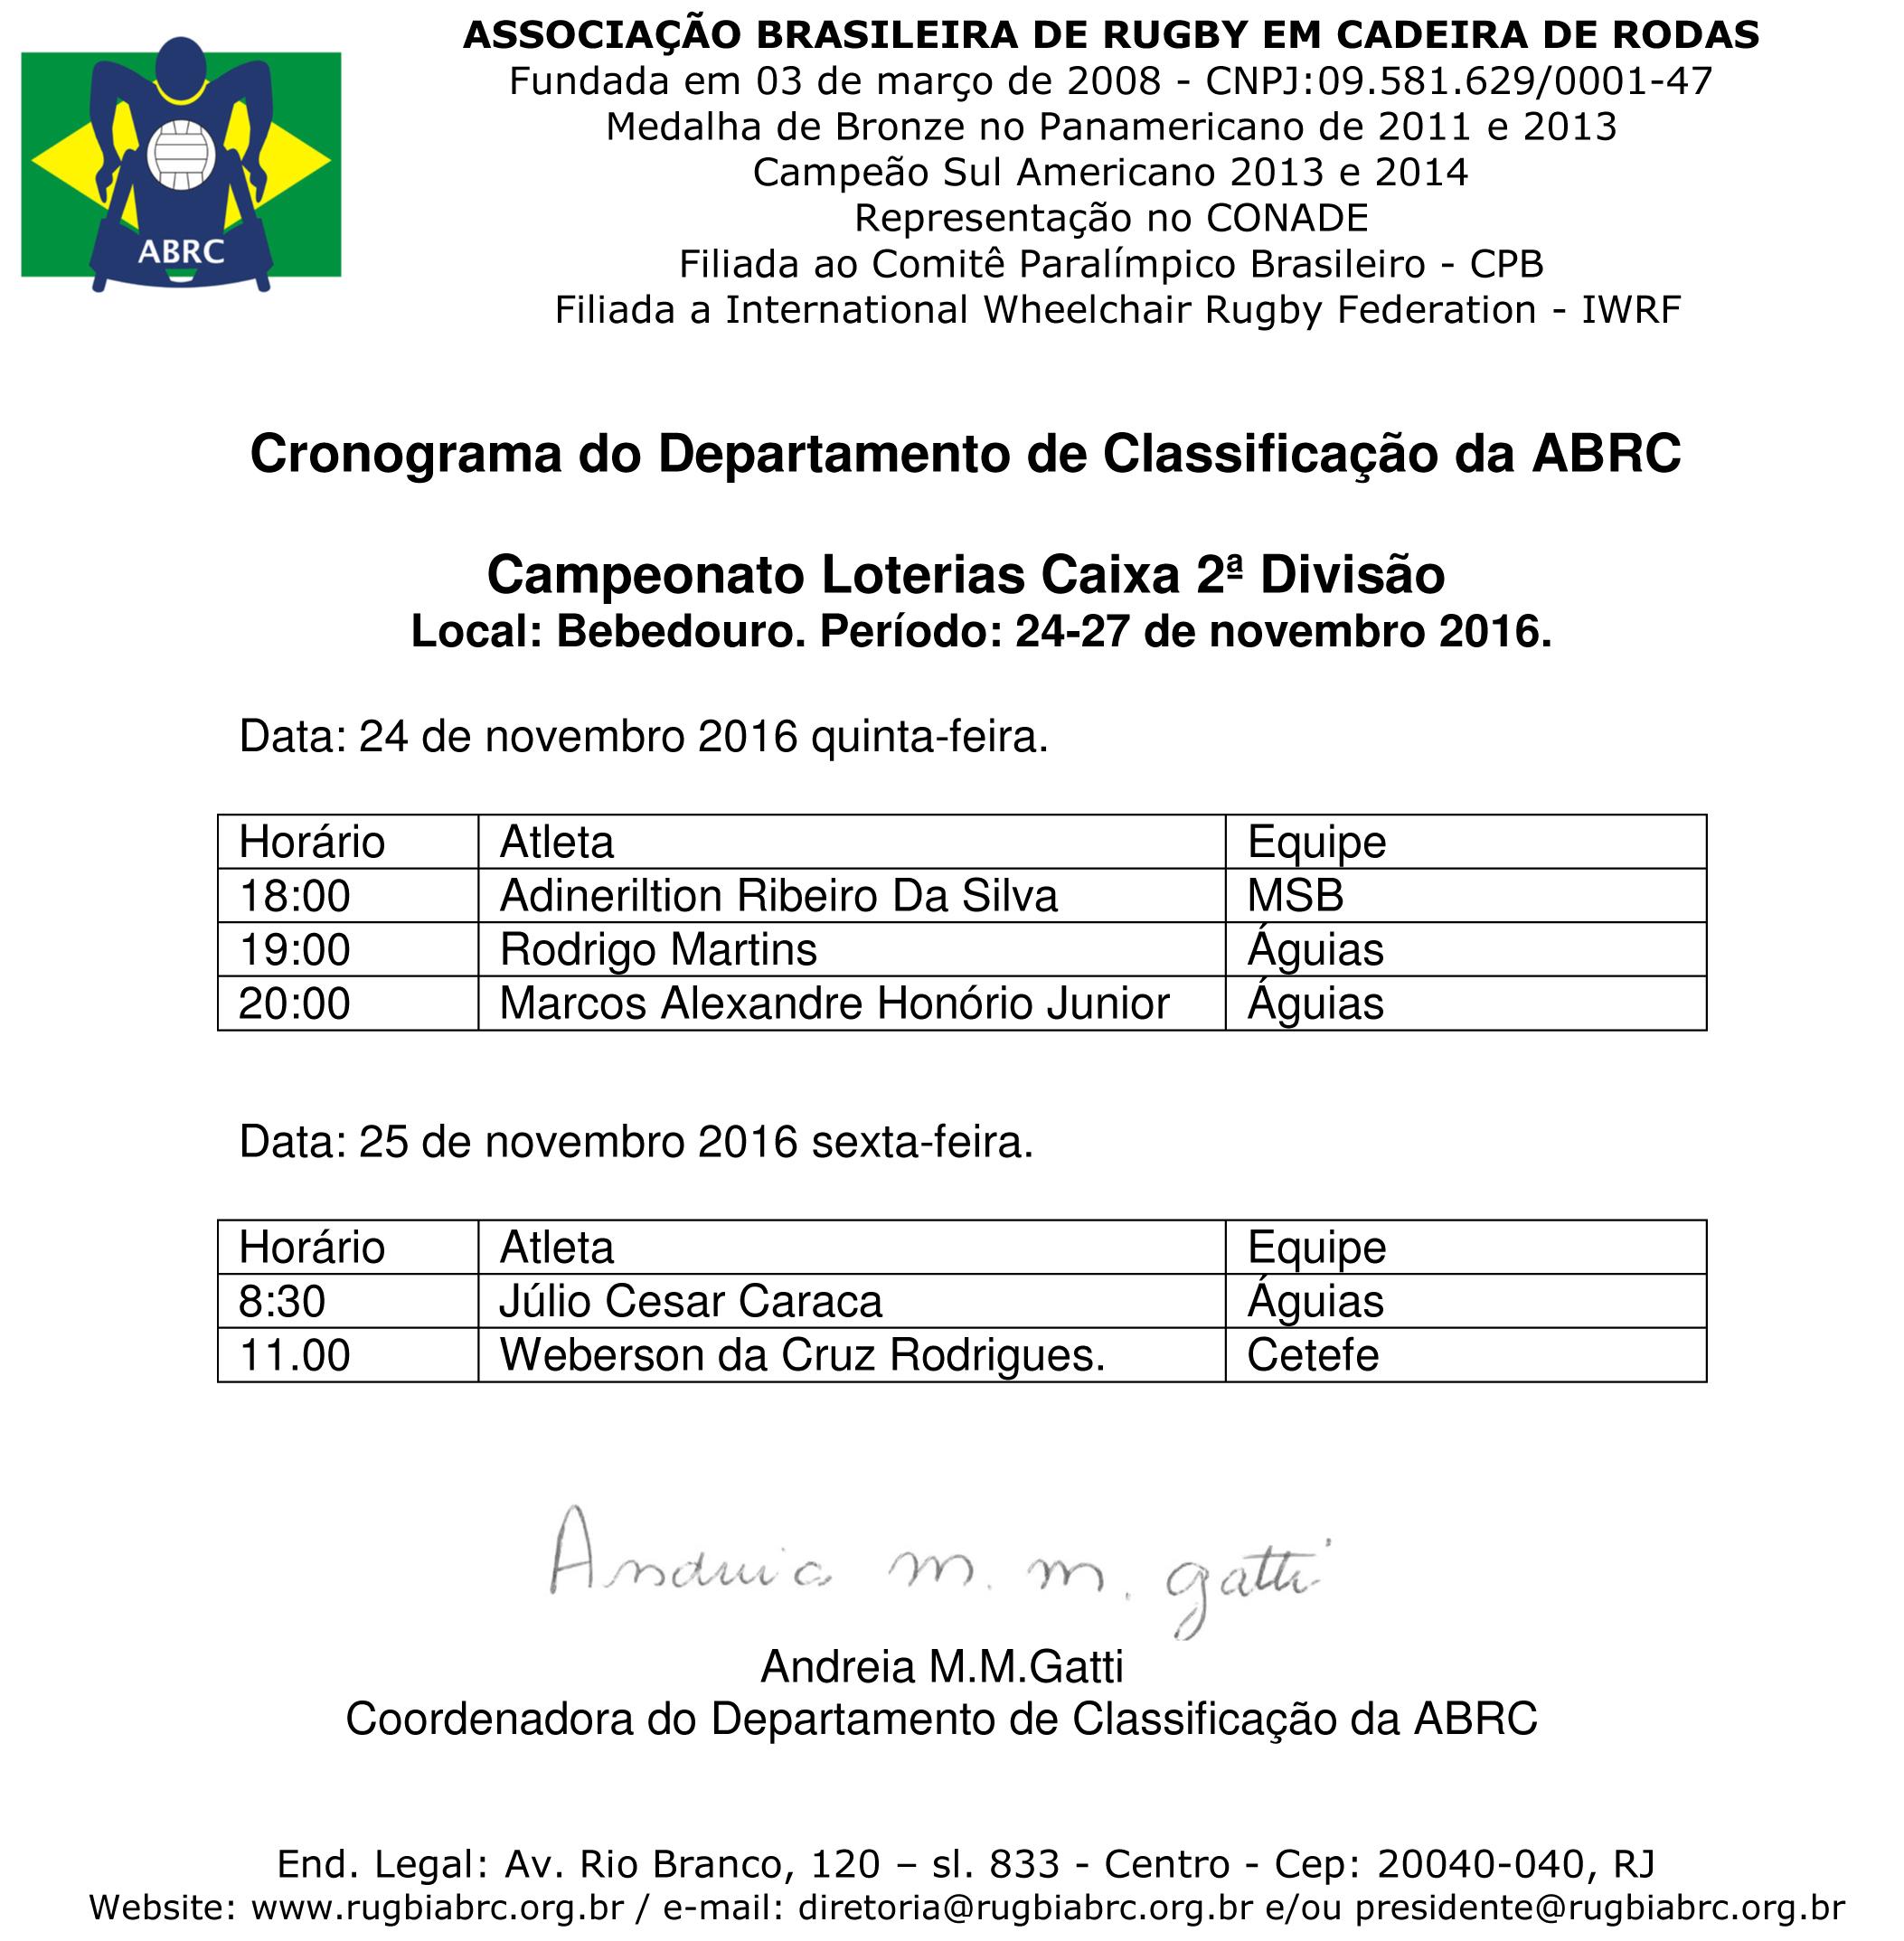 Microsoft Word - Cronograma Copa Caixa Bebedouro